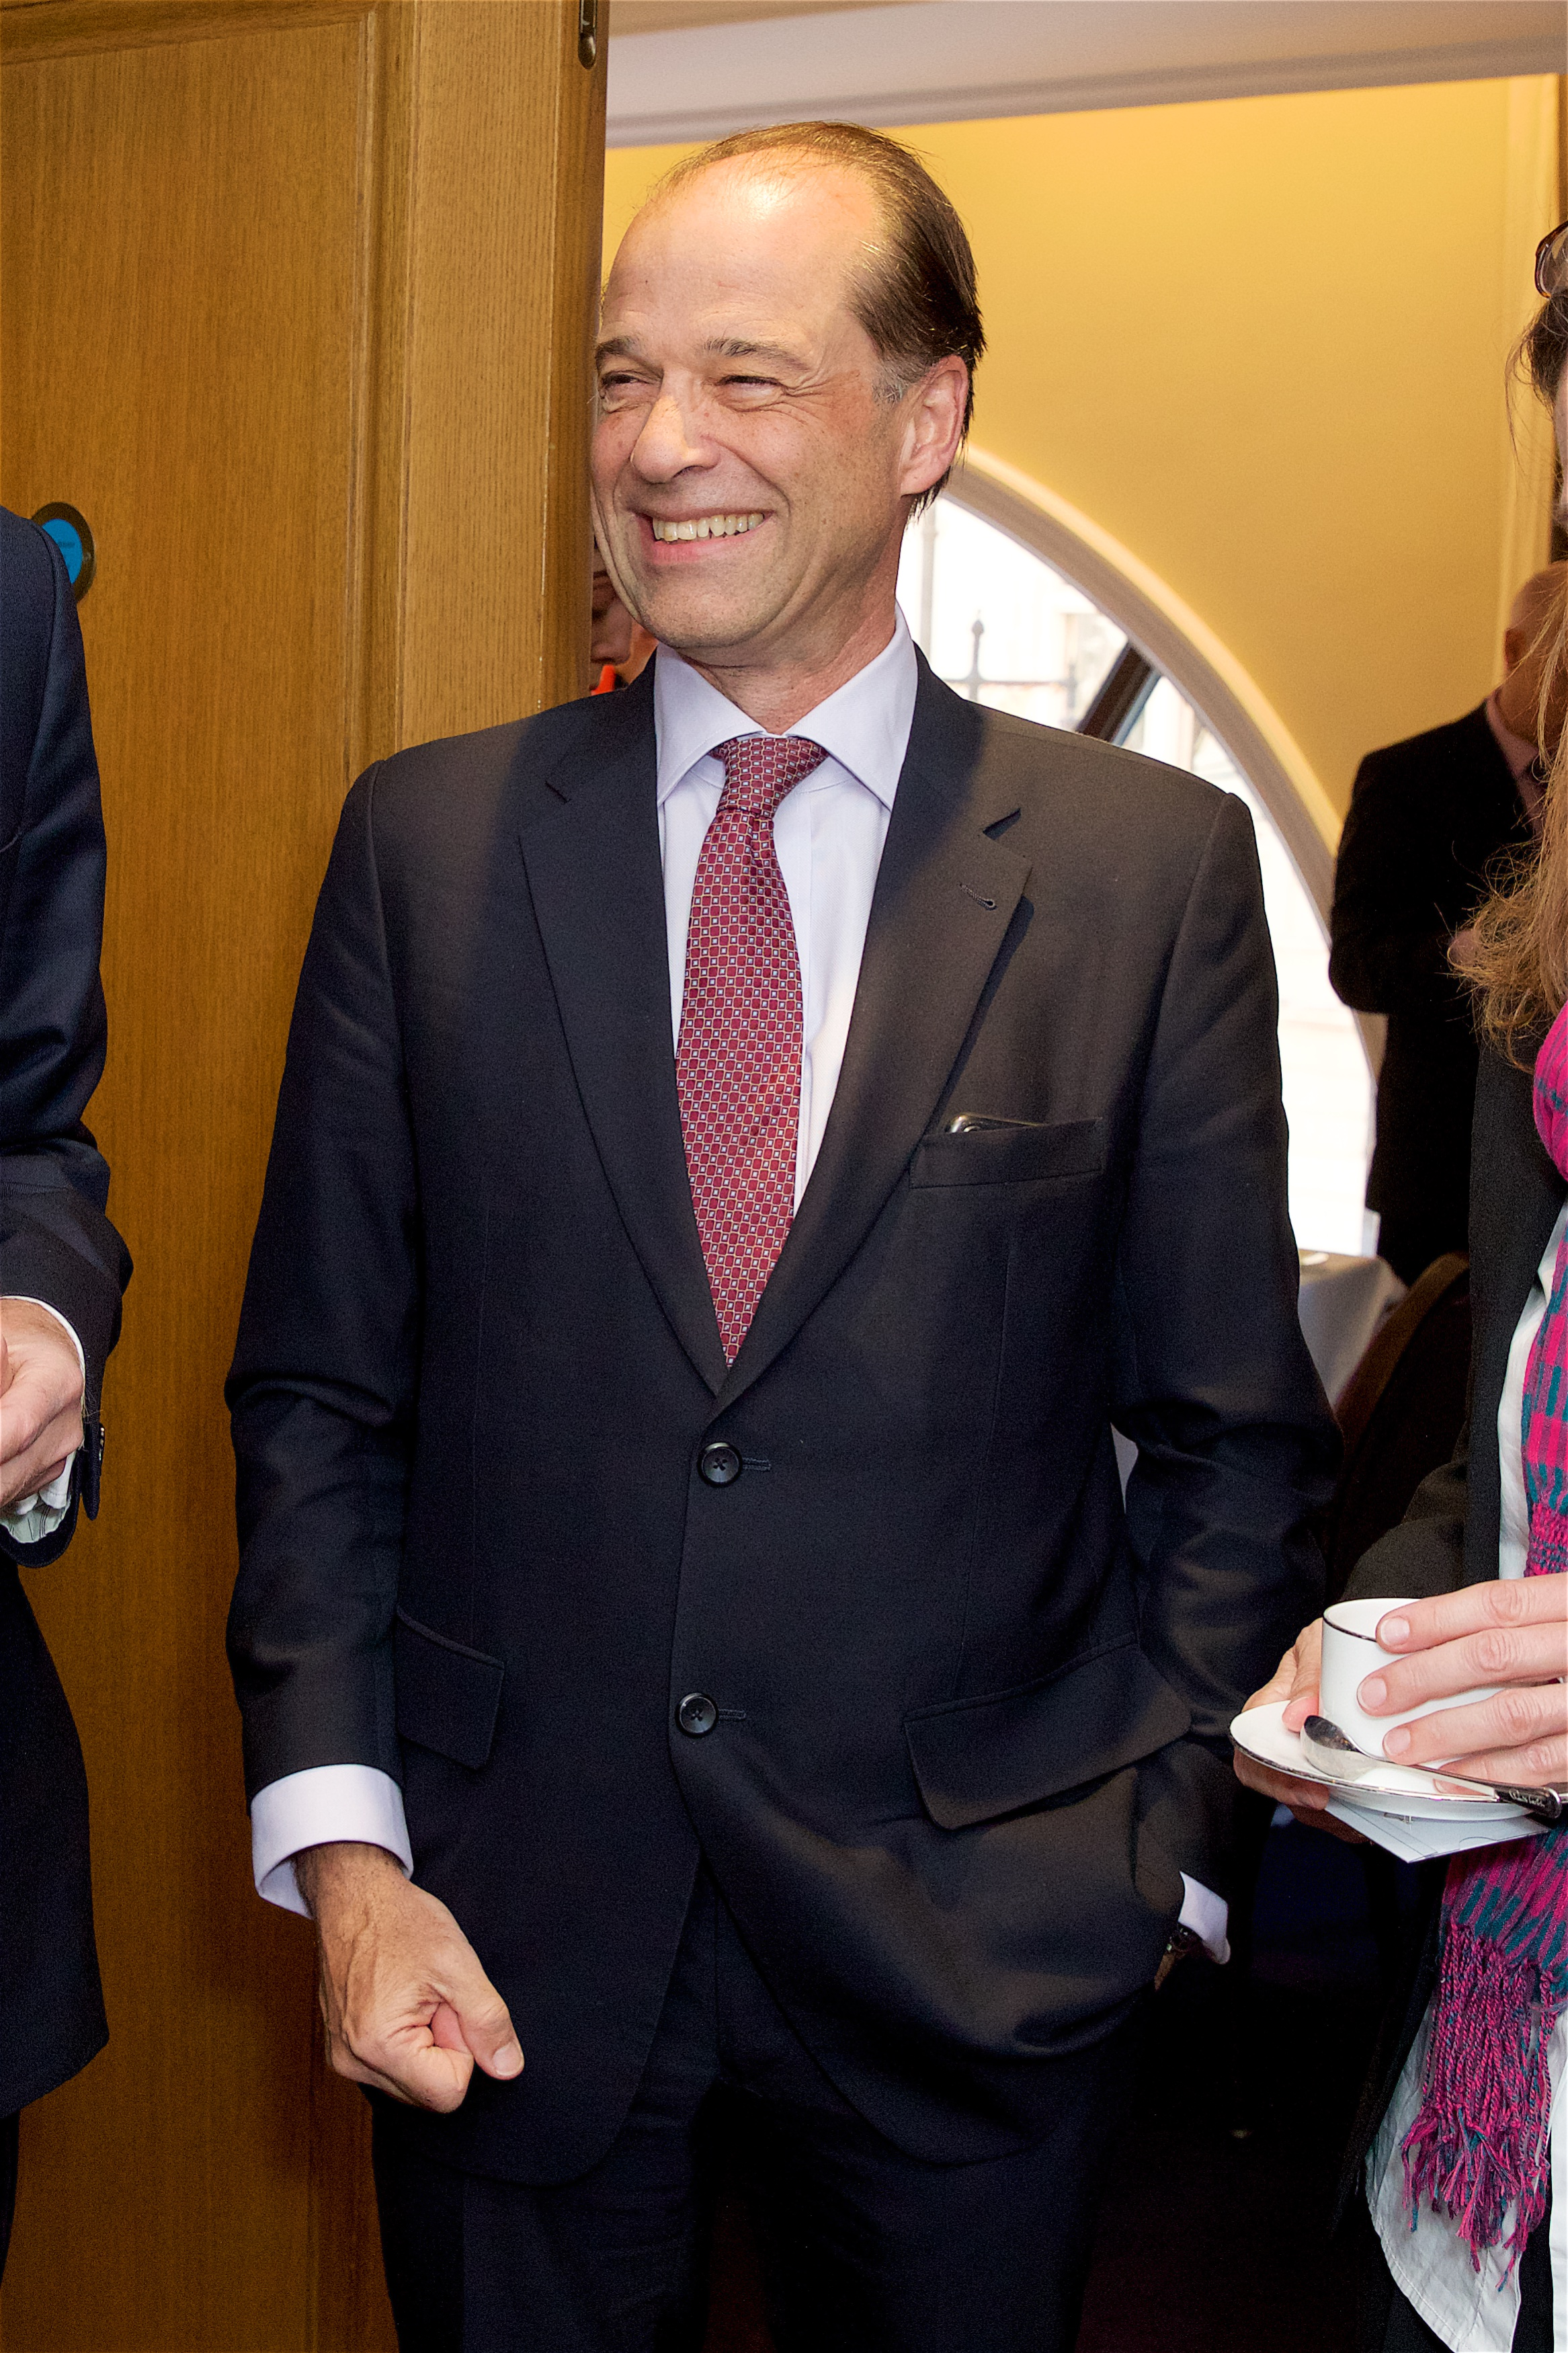 George Hollingbery MP